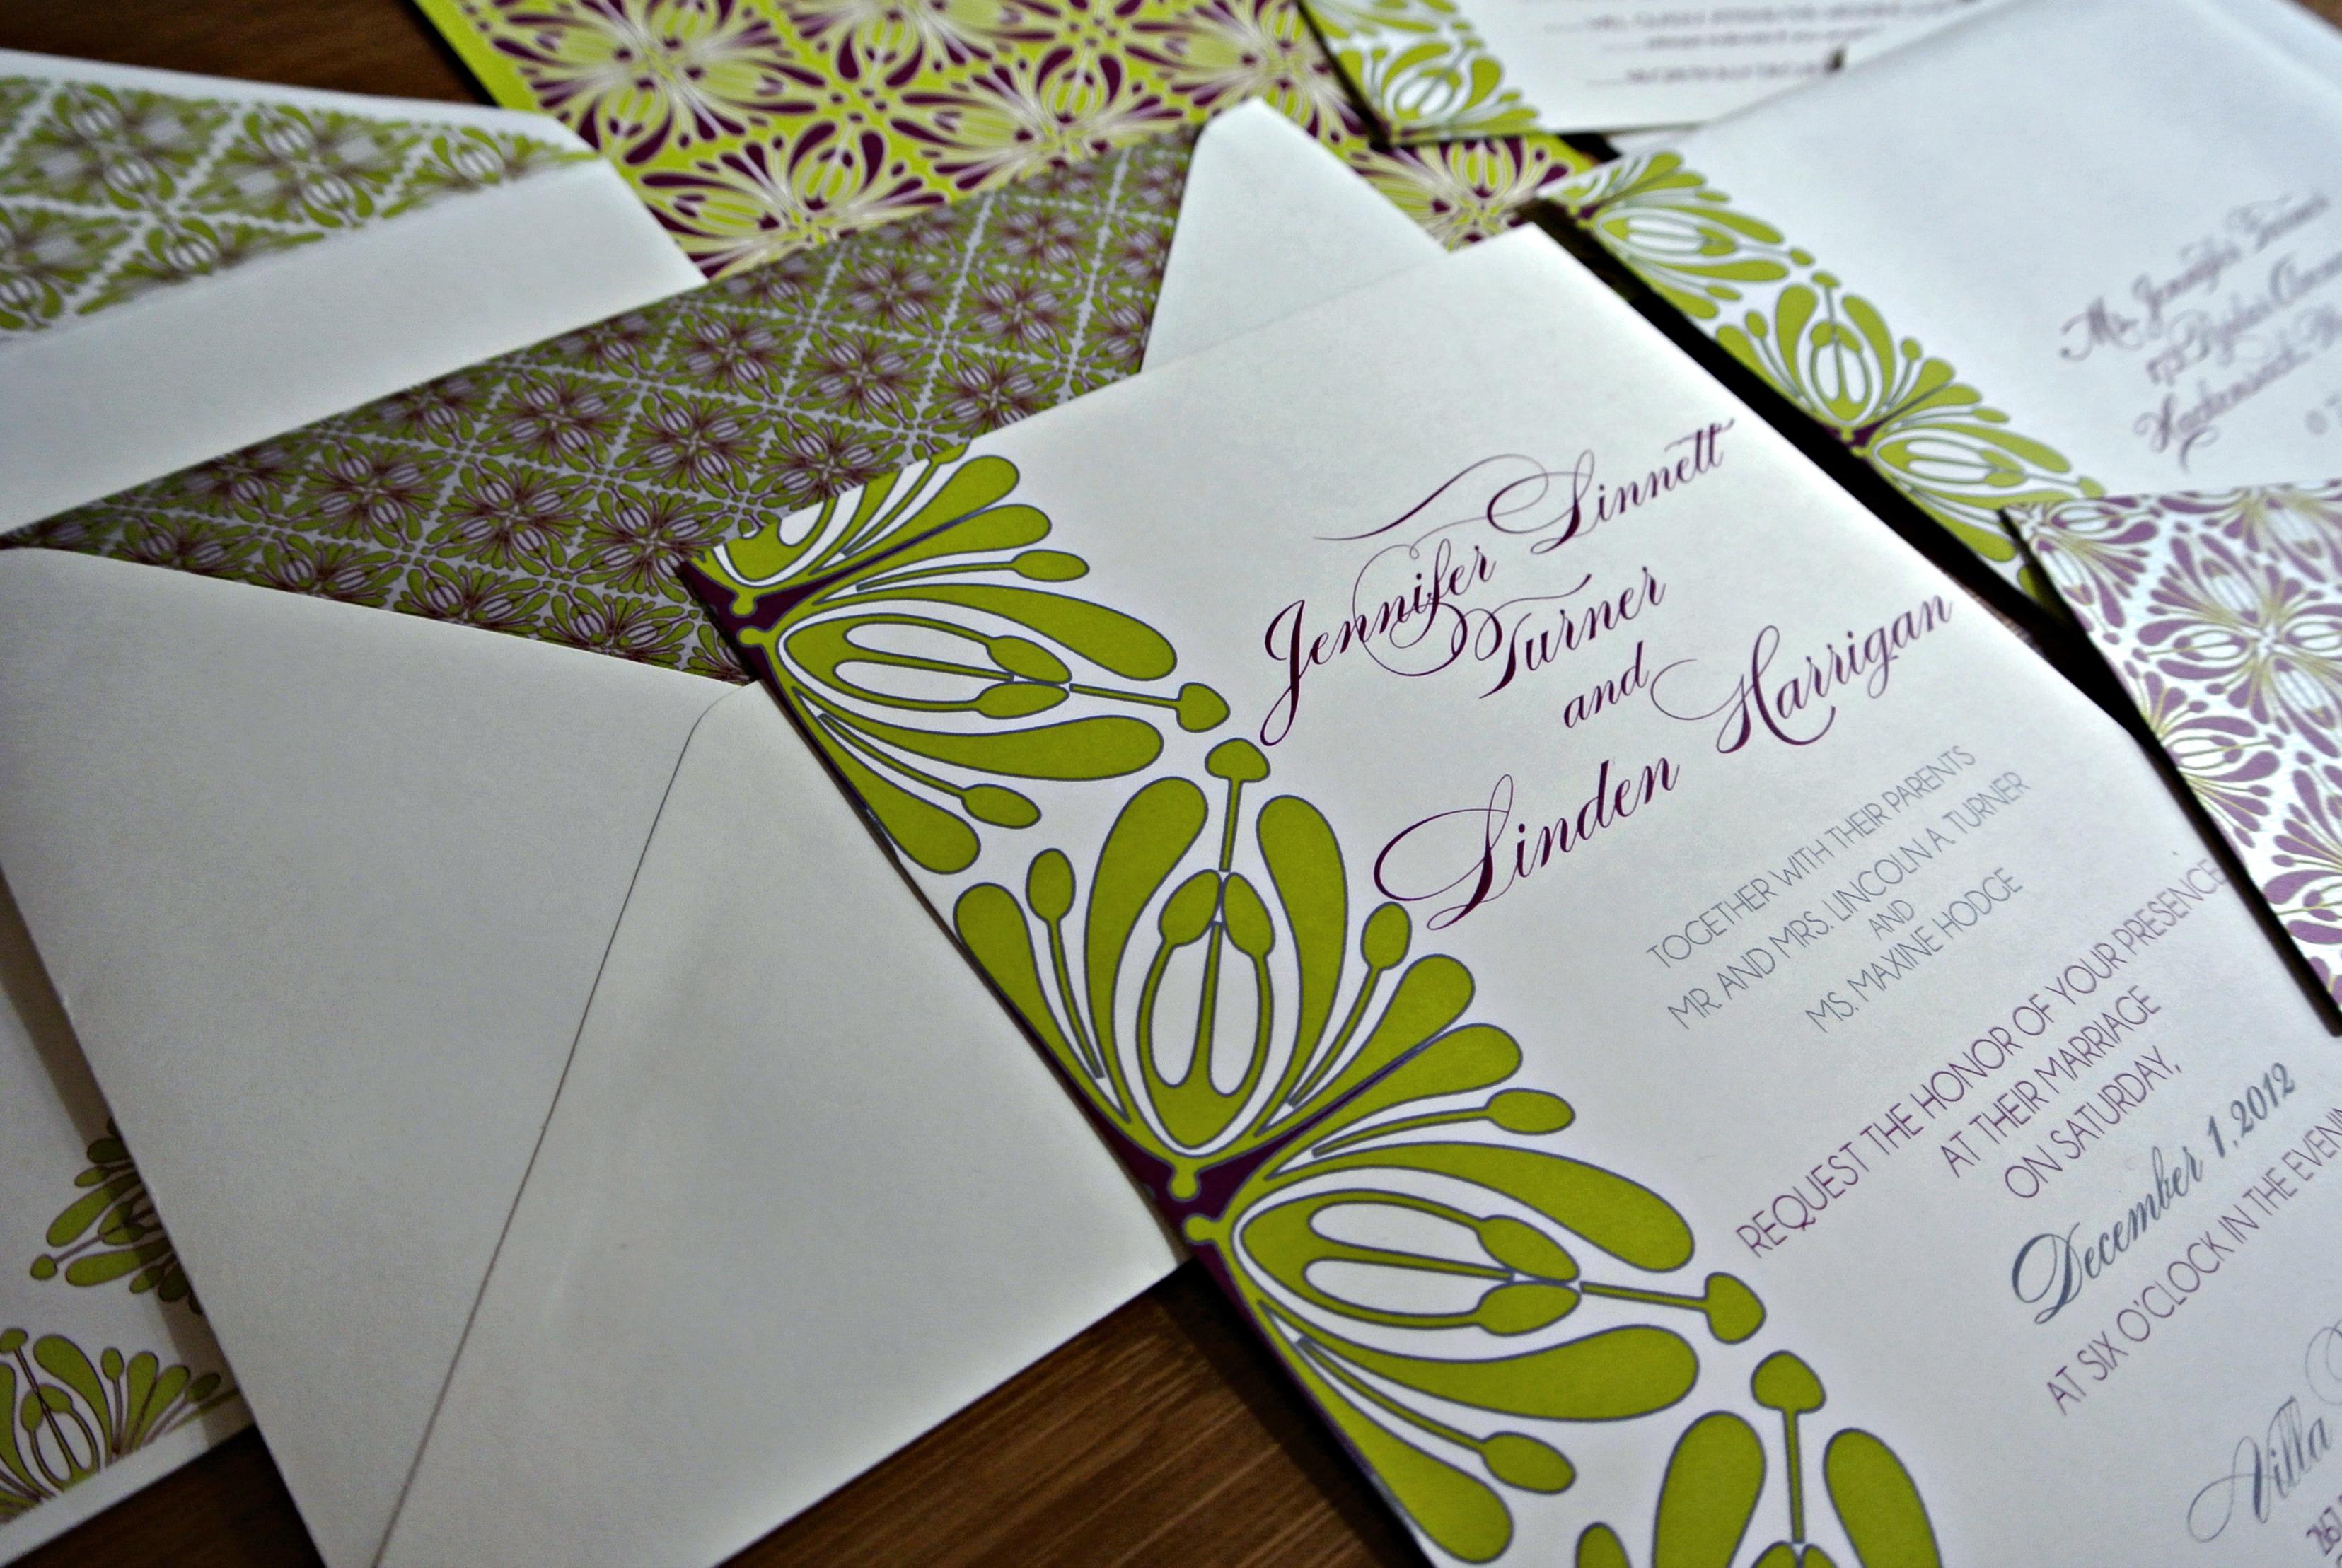 turner-wedding-invite-suite-photo-2-jpg